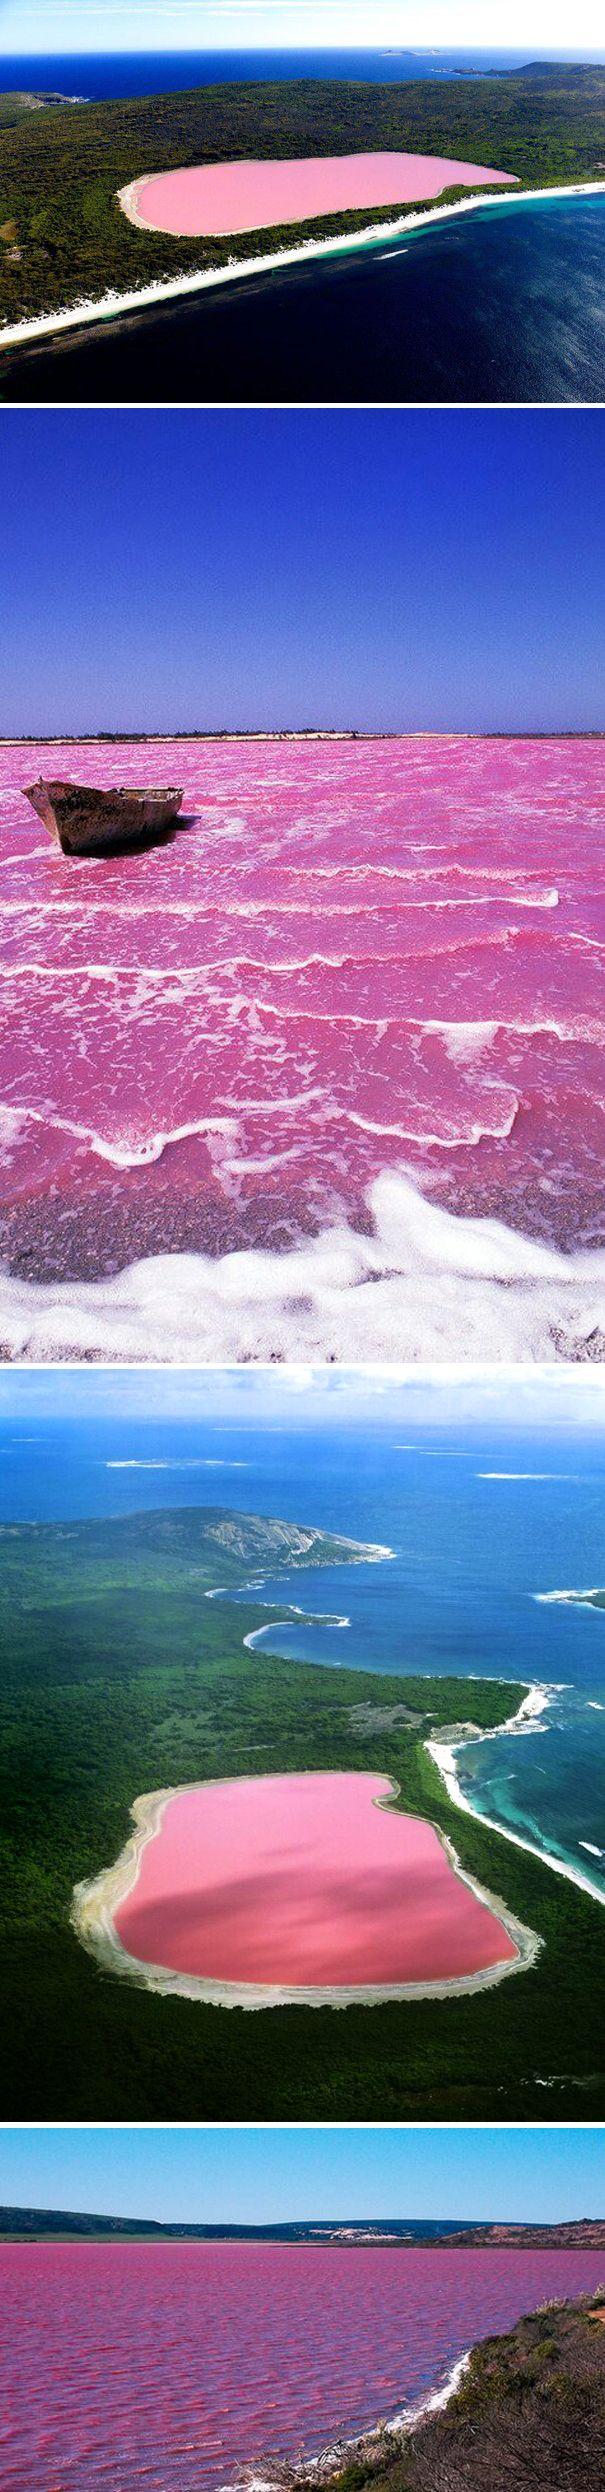 Unusual Pink Colored Lake Hillier in Australia